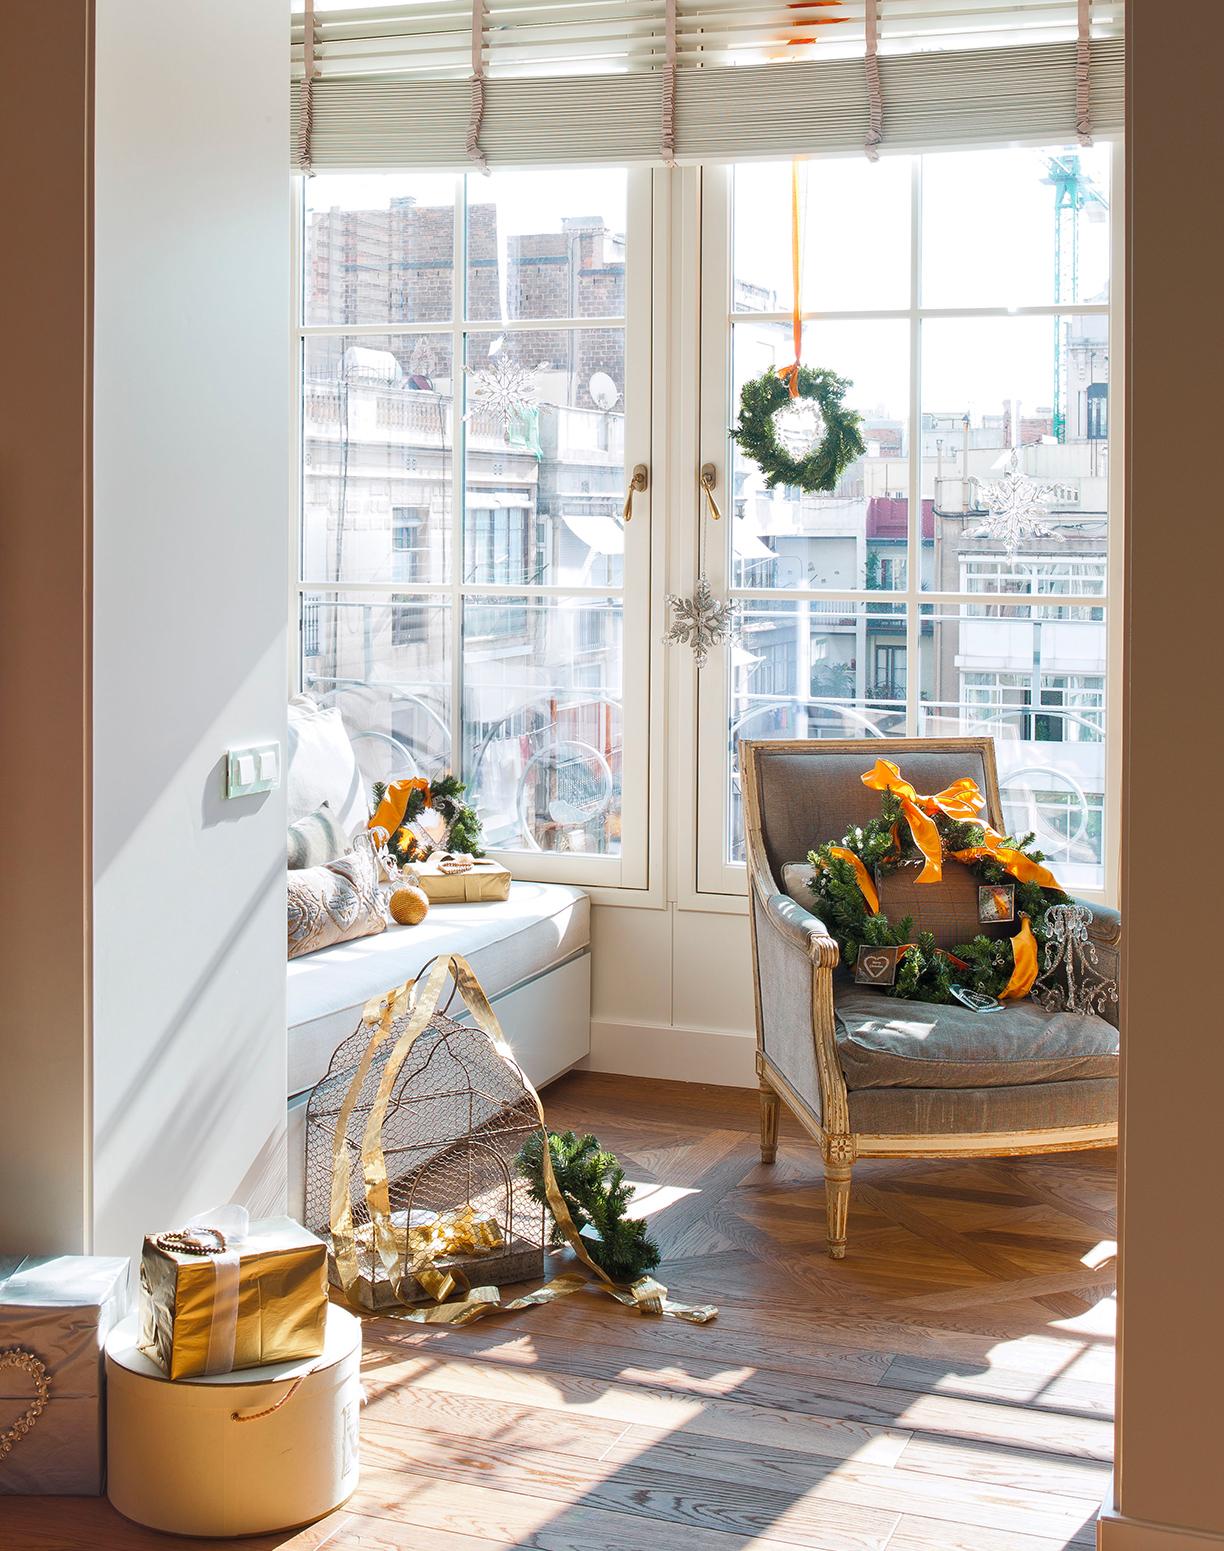 Navidad suave_5_WESTWING MAGAZINE